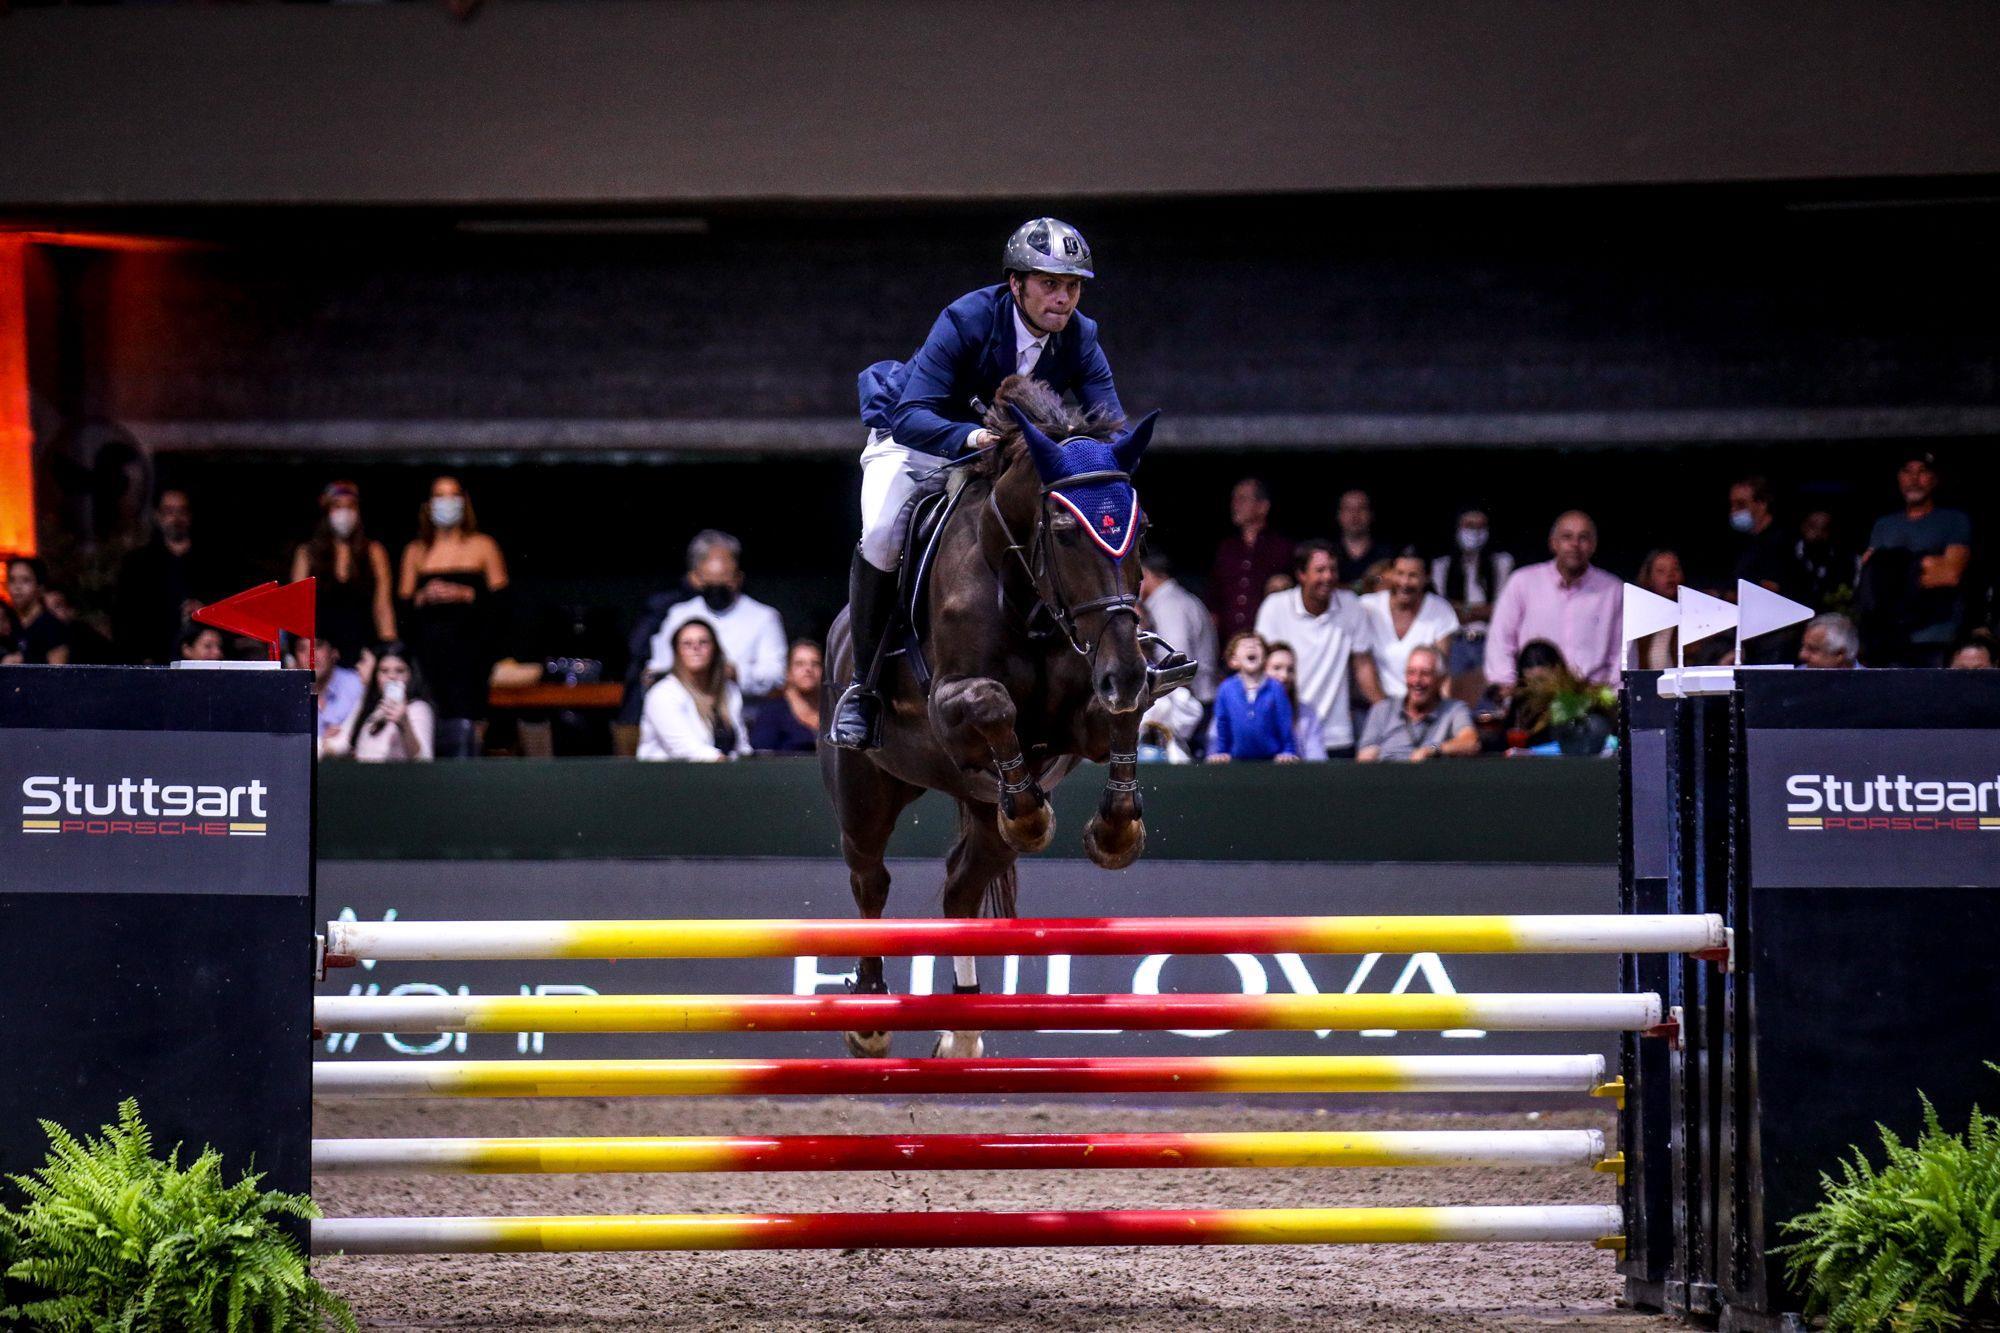 Nicolas Dattelkremer,  integrante da dupla 2ª colocada,  em seu percurso, Carro x cavalo,  Indoor,  prova,  hipismo,  desafio,  Hípica Paulista, Luis Ruas, Carro x cavalo agita o Indoor 2021